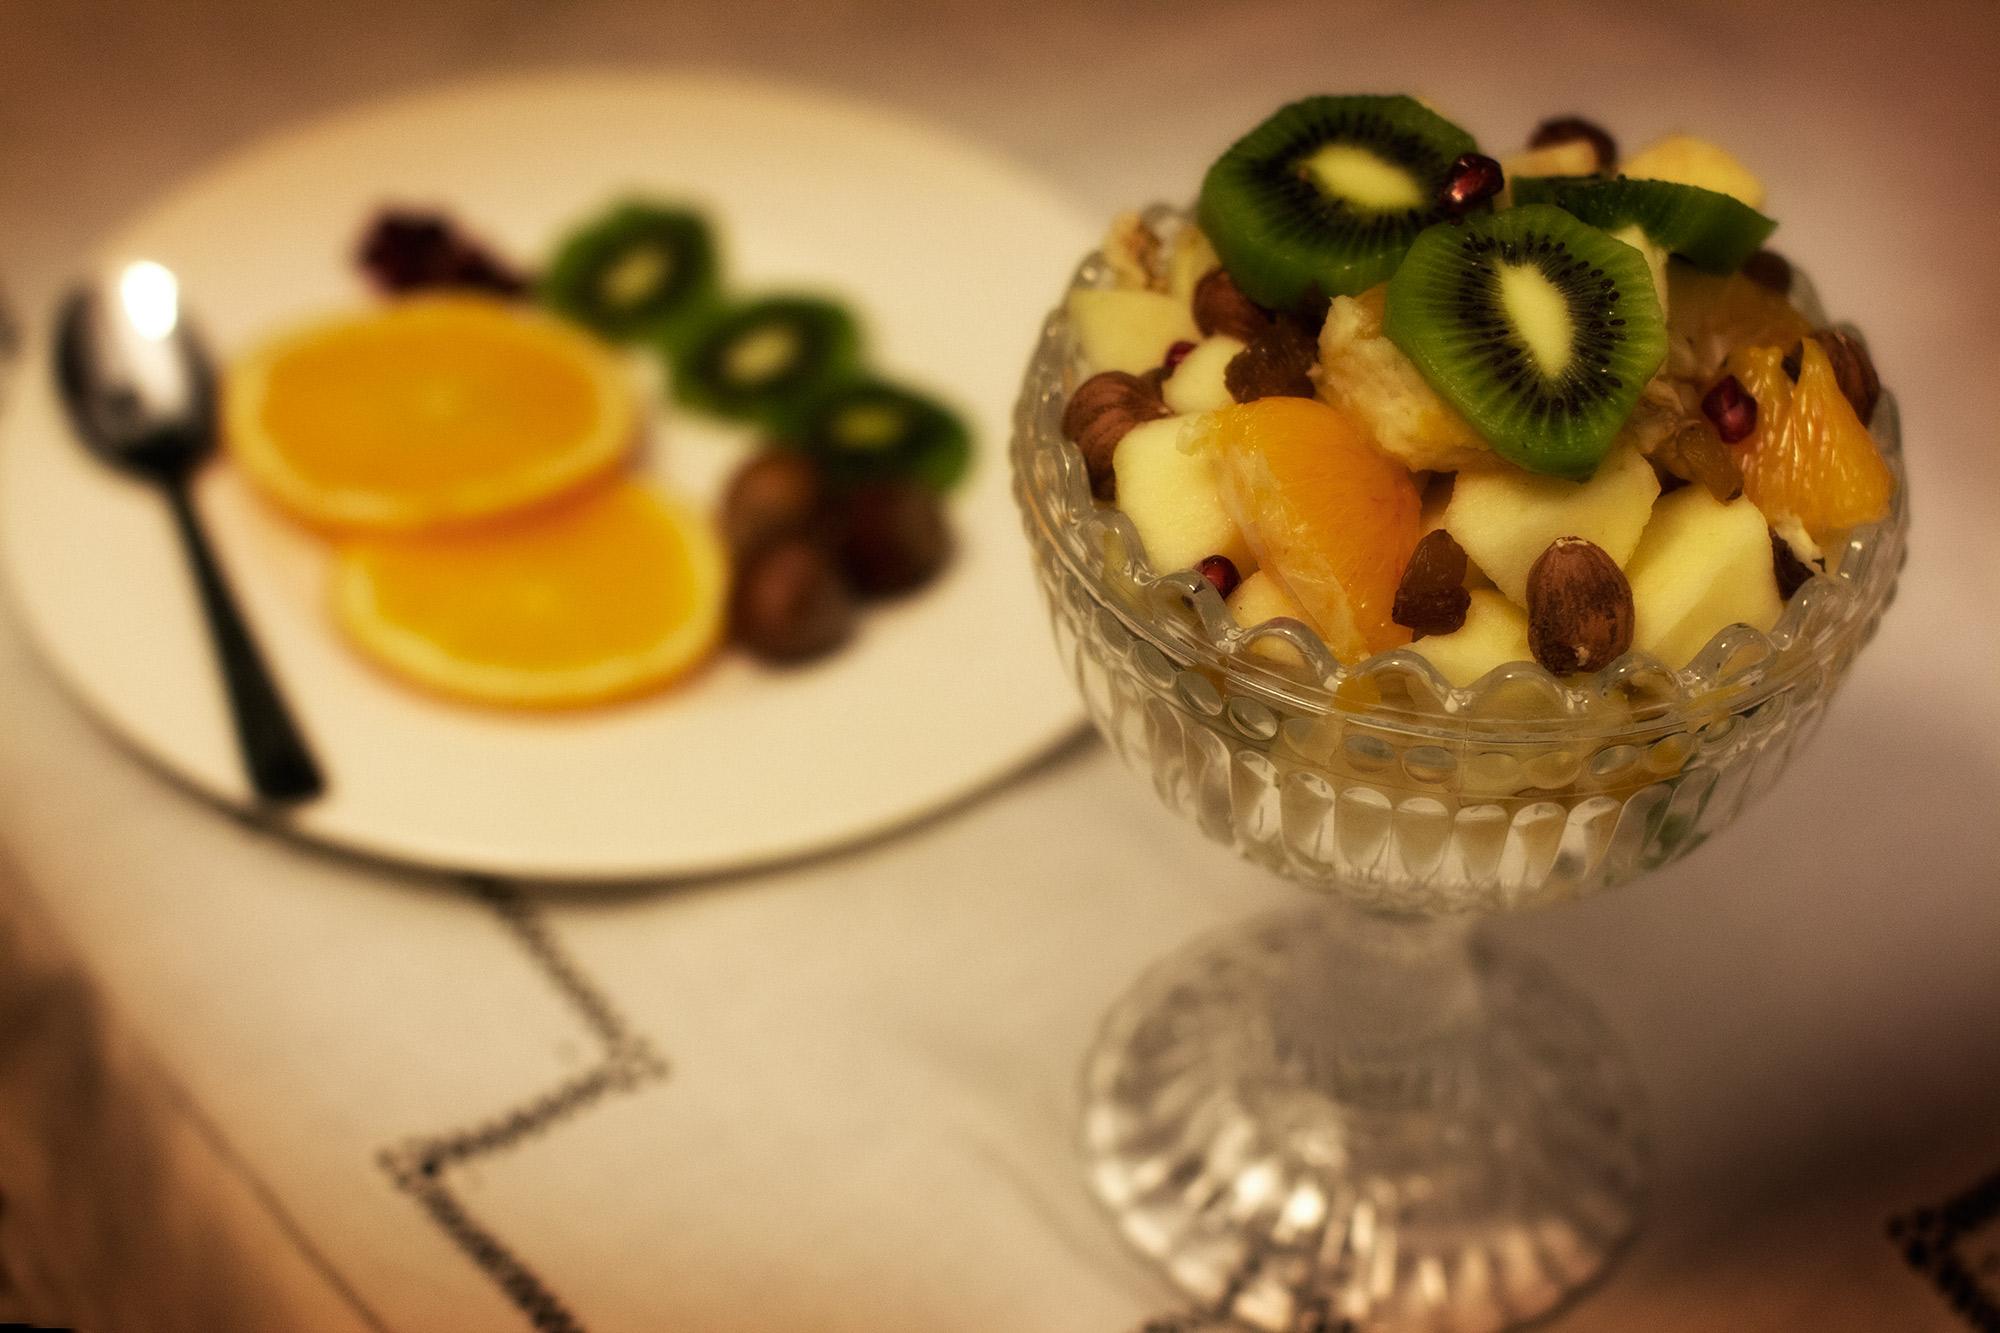 Macedonia invernale di frutta fresca e secca